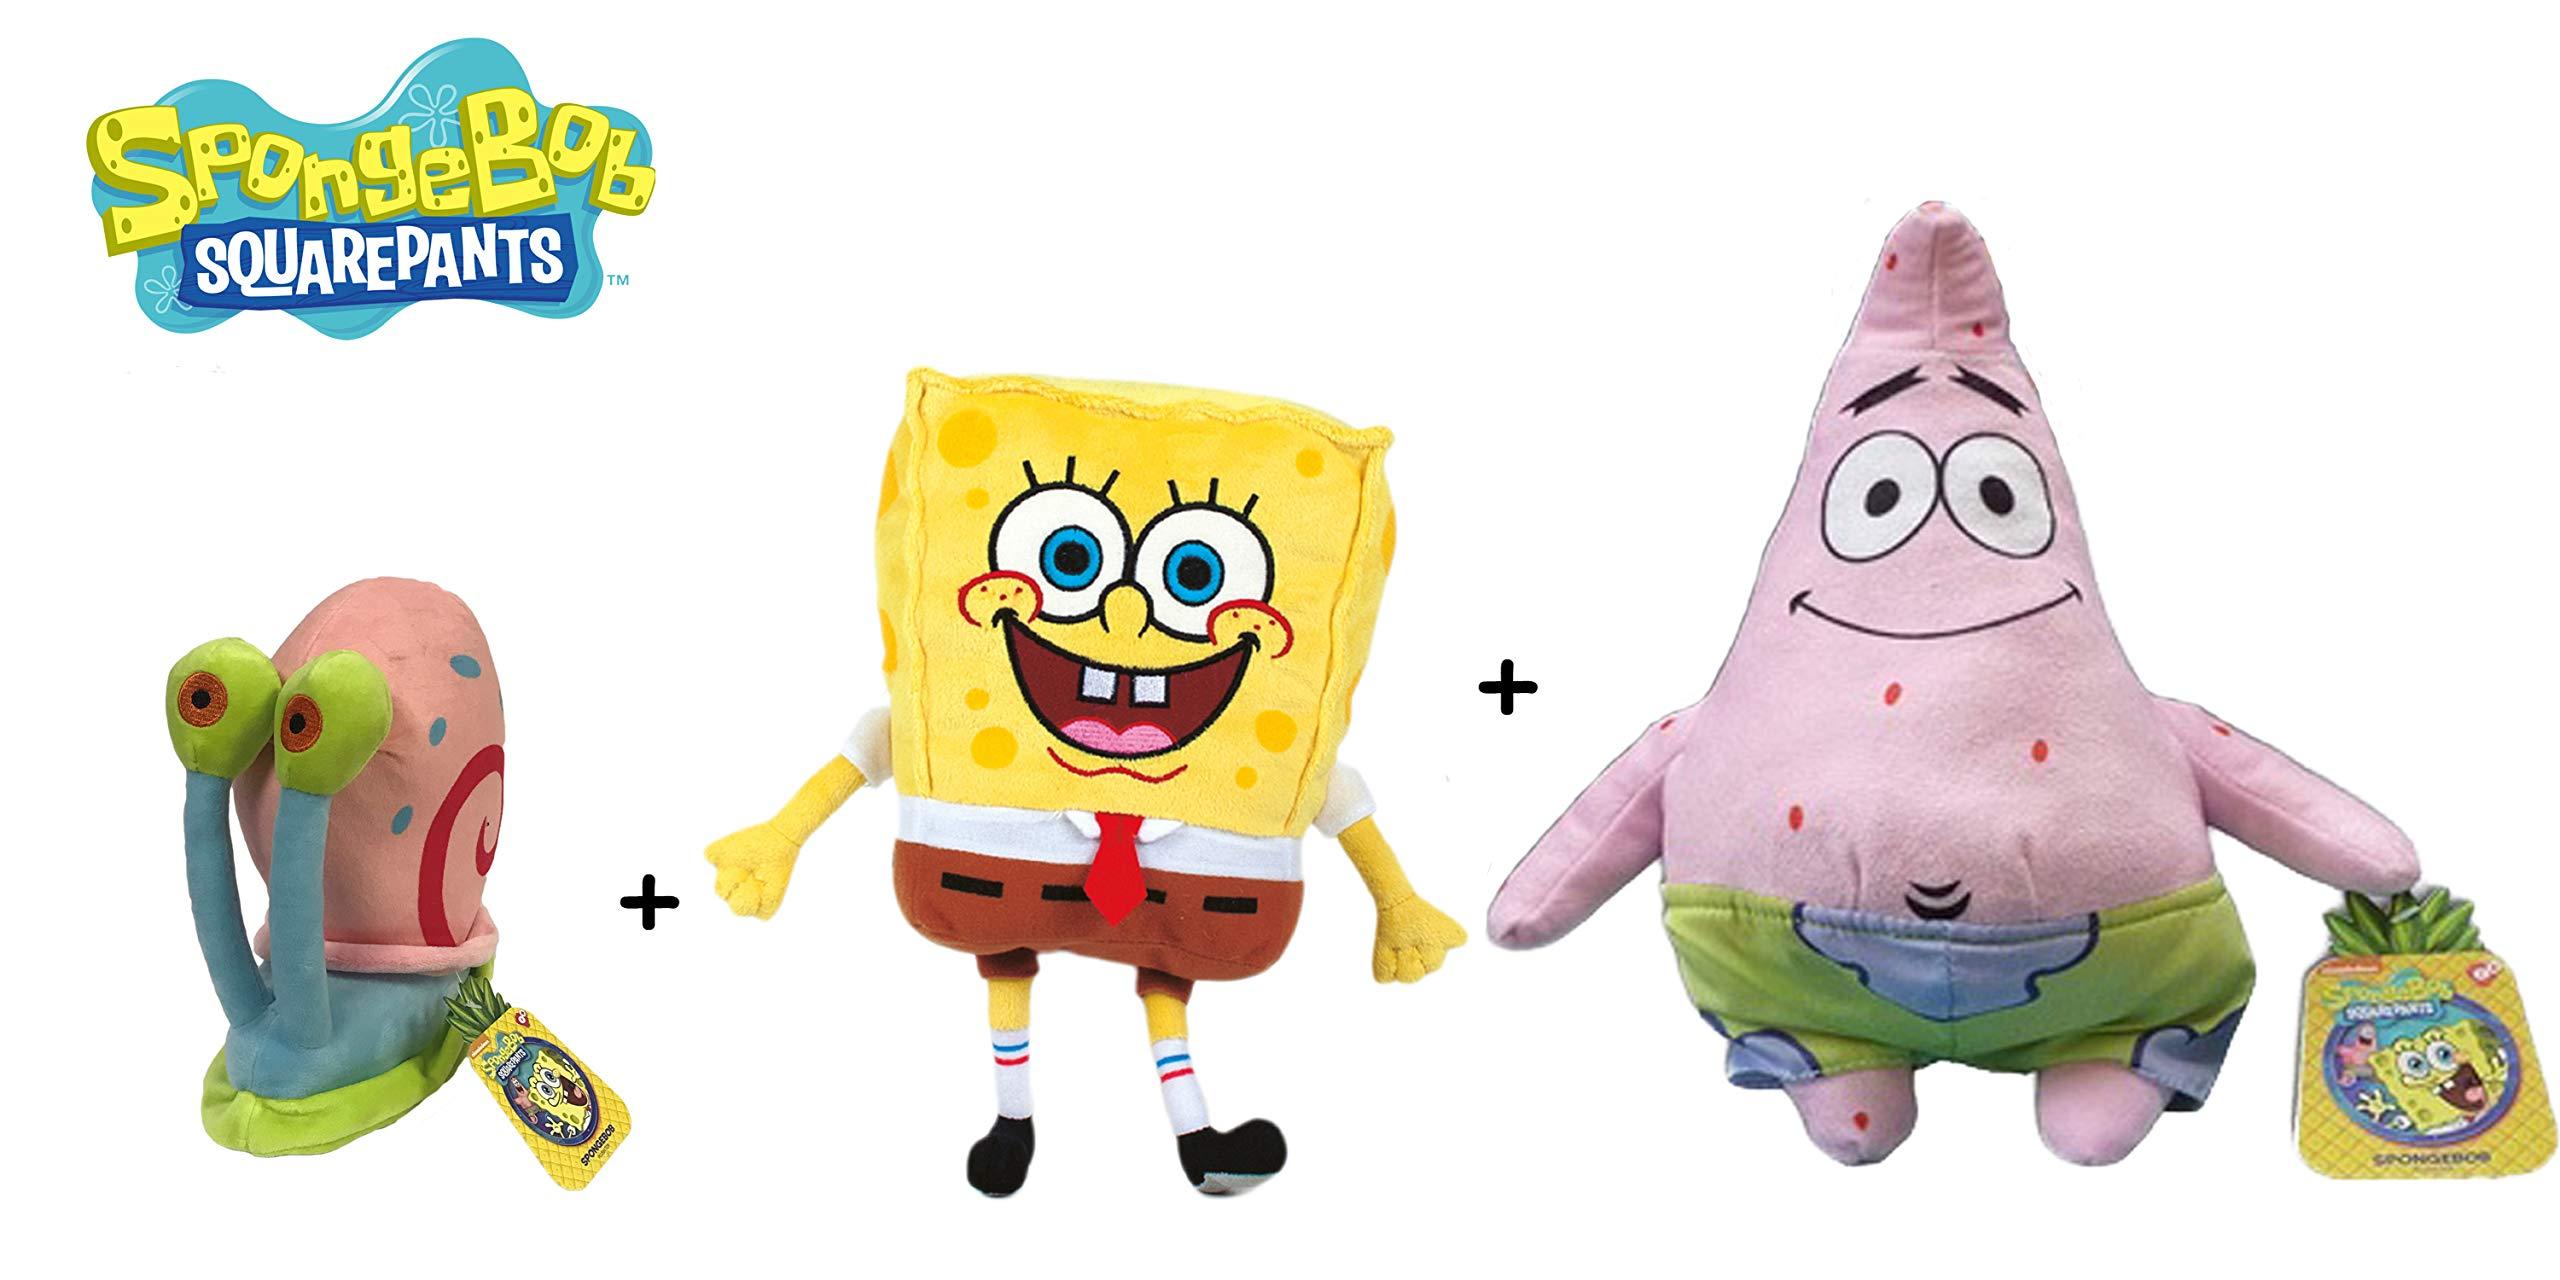 SPONGEBOB - Set of 3 Plush Toys ''Bob''(yellow 7''/18cm), ''Patrick'' (pink 8''/22cm) and ''Gary'' (pink 5''/13cm) - Quality Super Soft by SpongeBob SquarePants